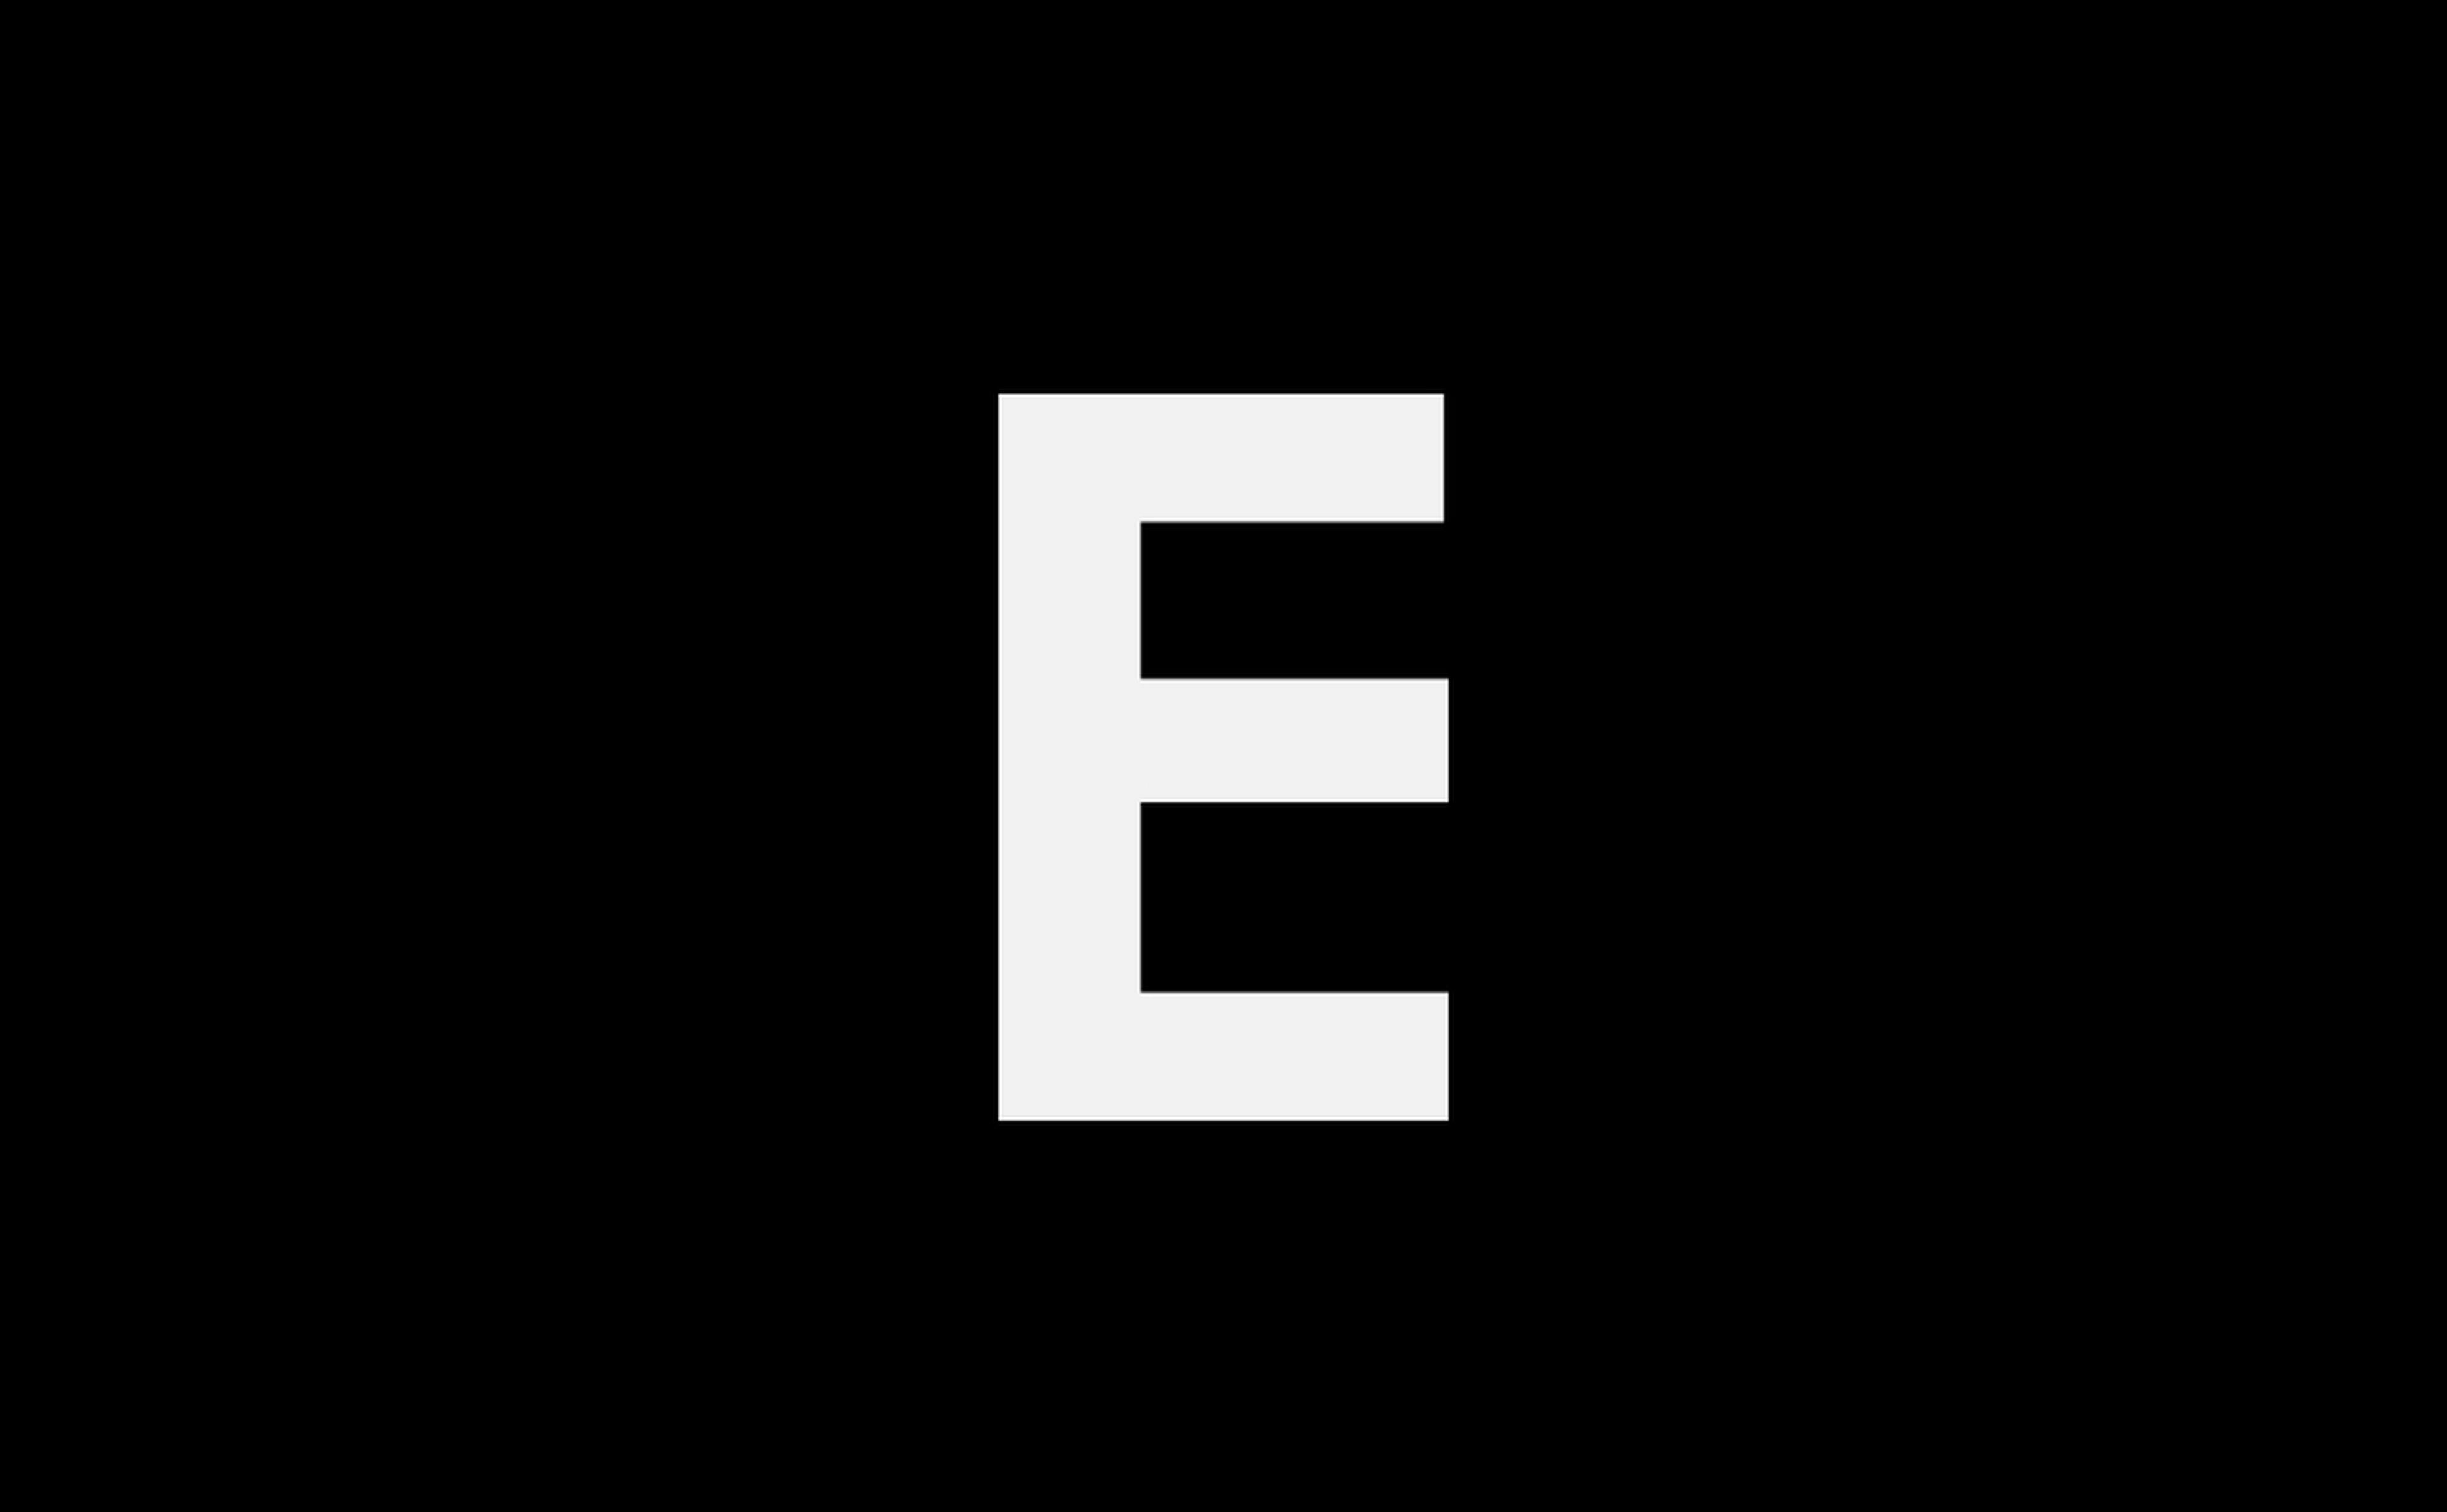 close-up, human eye, looking at camera, portrait, part of, eyelash, human face, eyesight, indoors, headshot, human skin, extreme close up, extreme close-up, full frame, sensory perception, detail, studio shot